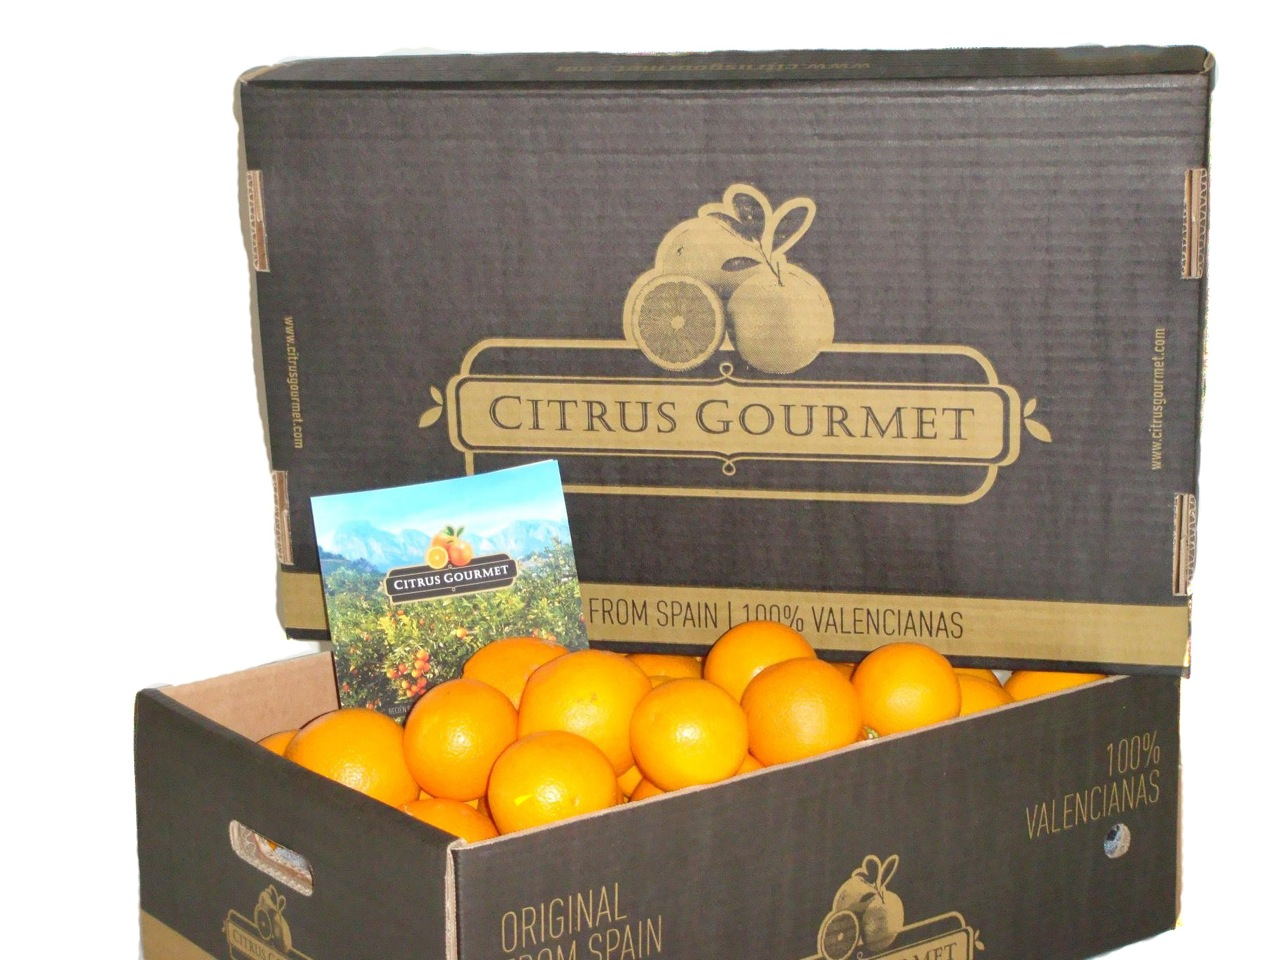 JUICING PACK: 7.5 Kg Oranges (37 pieces) + 7.5 kg Tangerines (40 pieces) for juicing